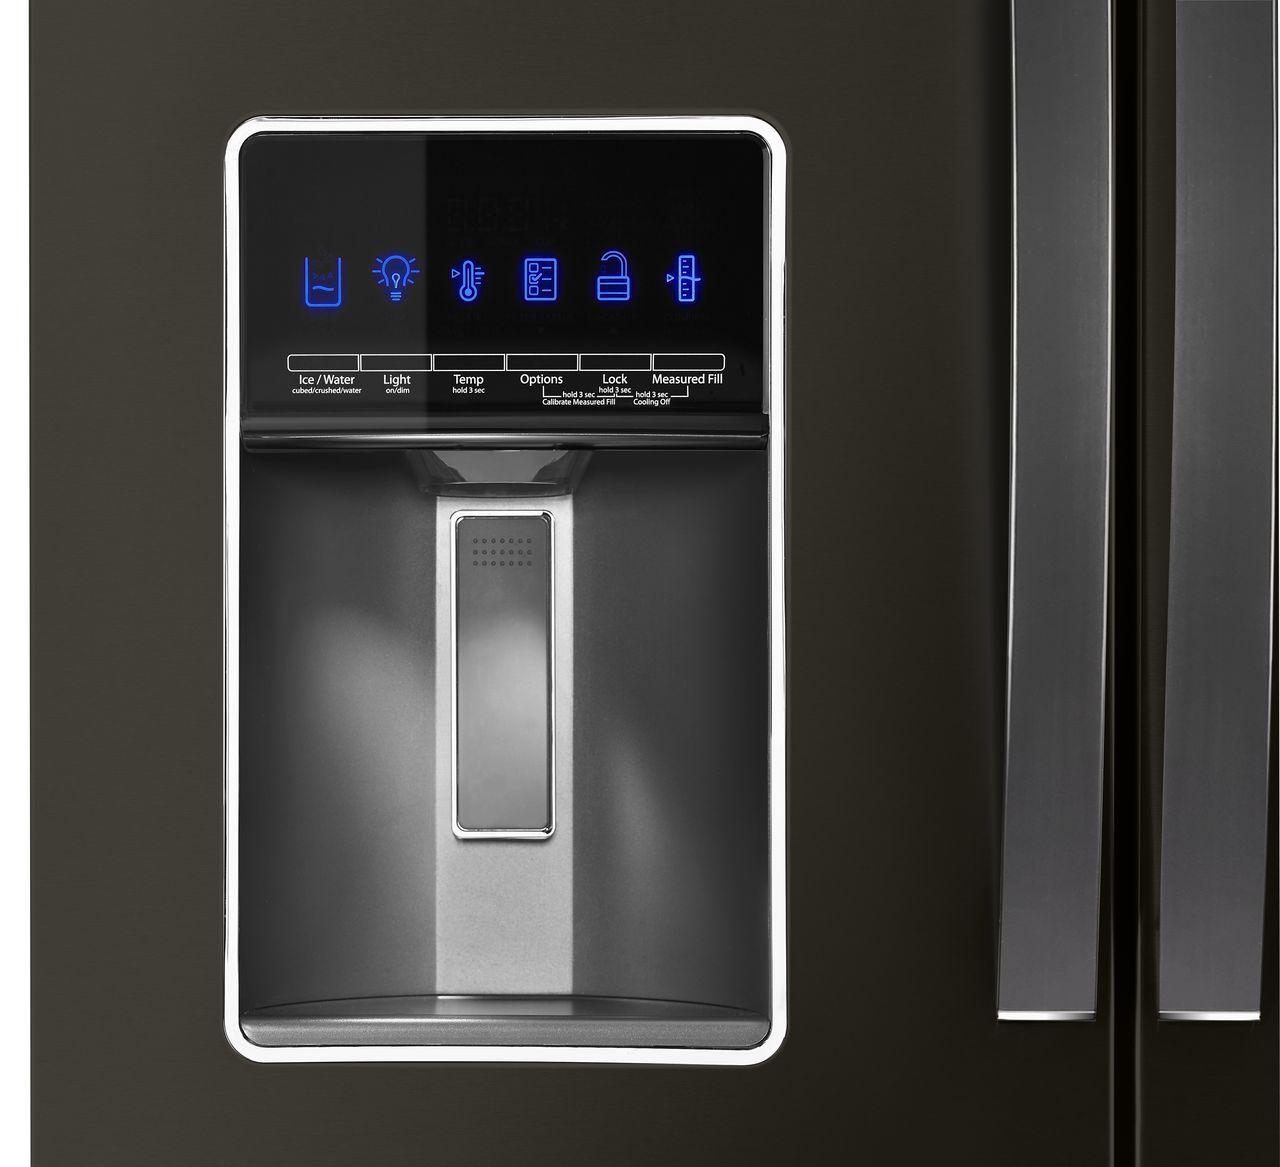 Whirlpool Black Stainless Refrigerator Wrx986sihv